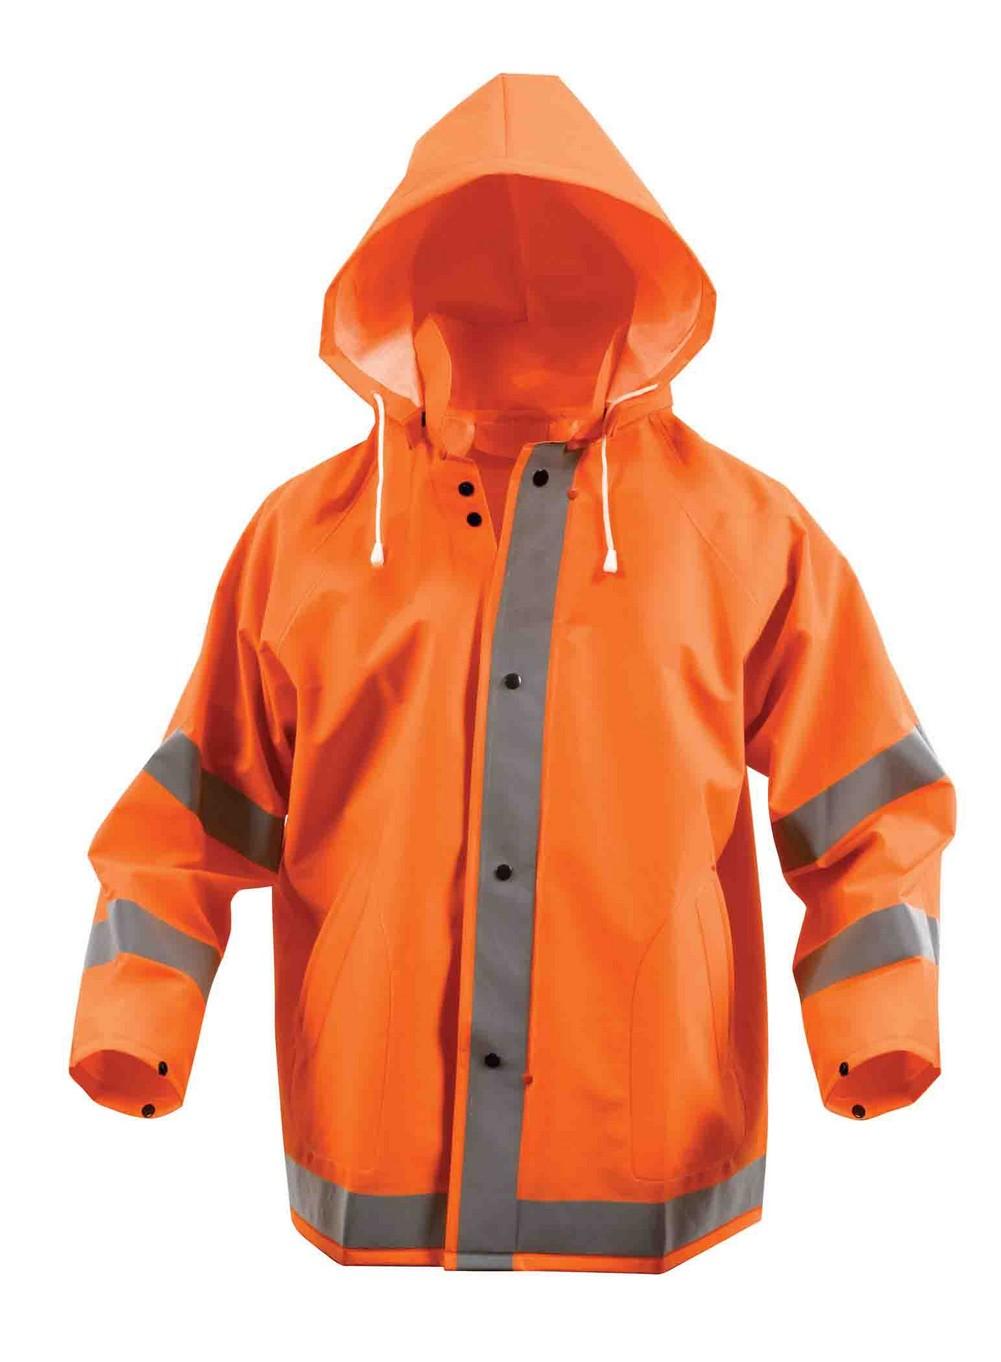 Rothco Mens Rain Jacket - Safety Reflective, Safety Orange by Rothco at Sears.com